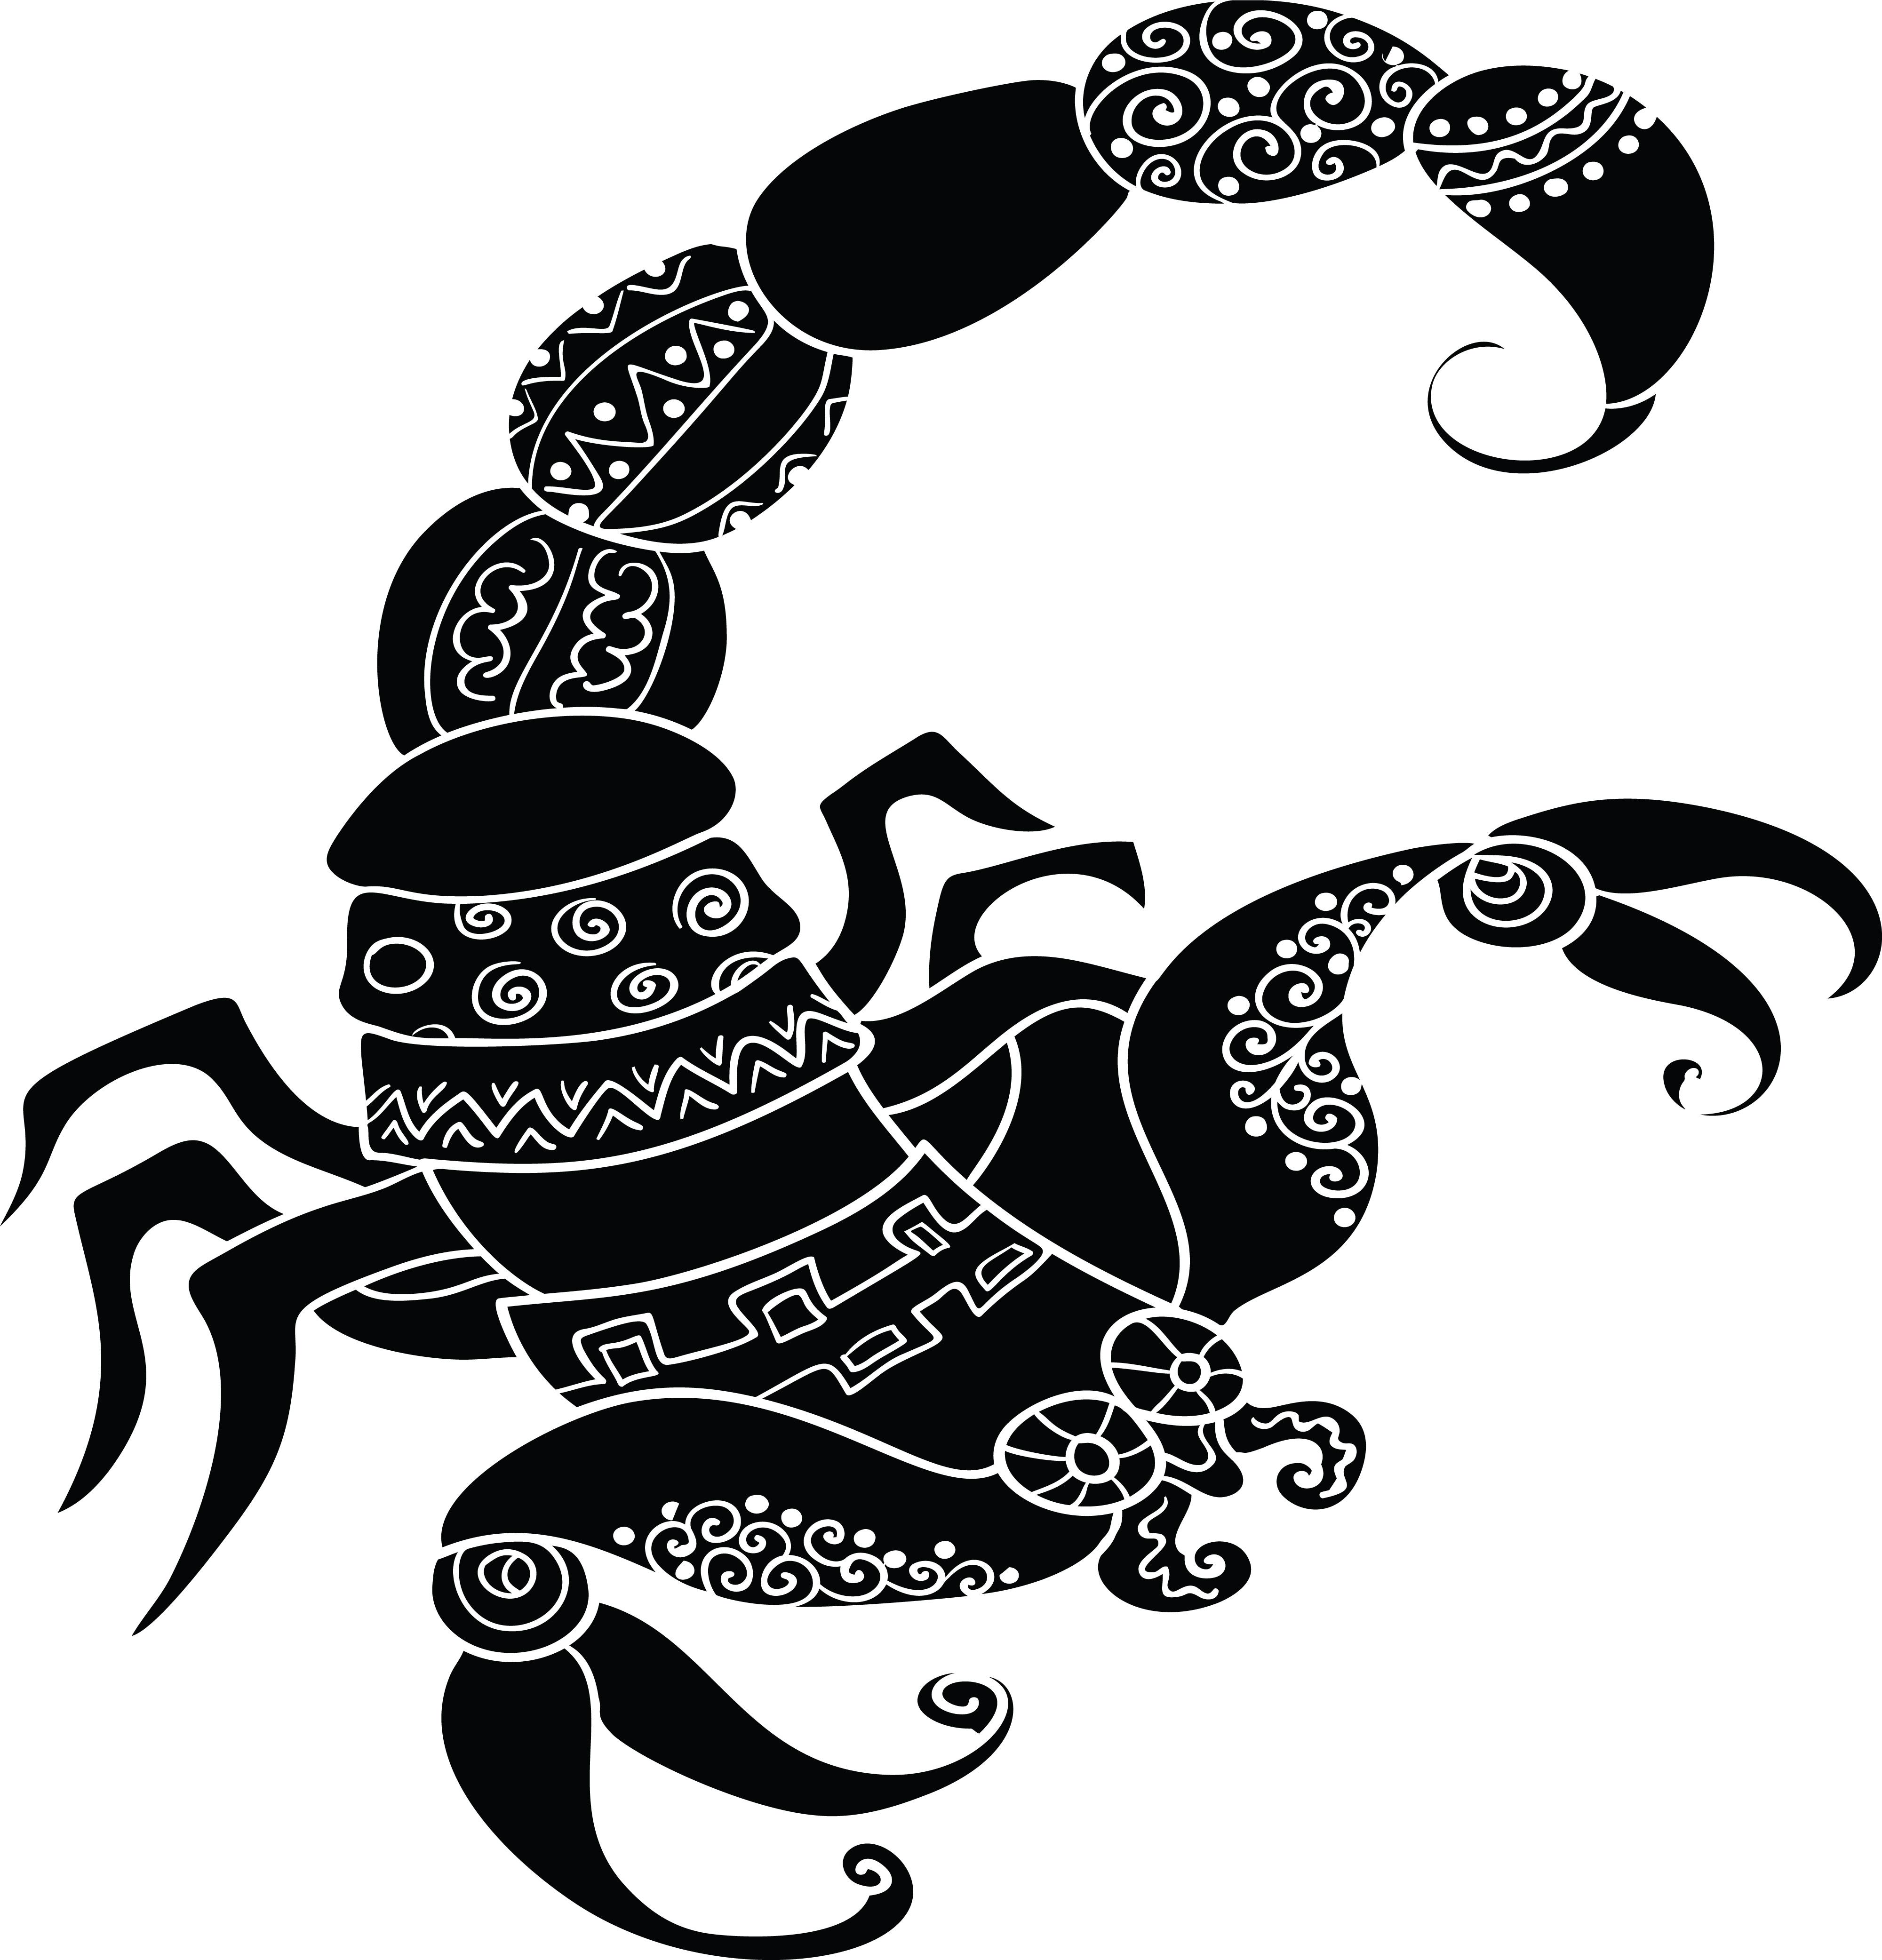 Scorpio clipart graphic royalty free 17+ Scorpio Clipart | ClipartLook graphic royalty free